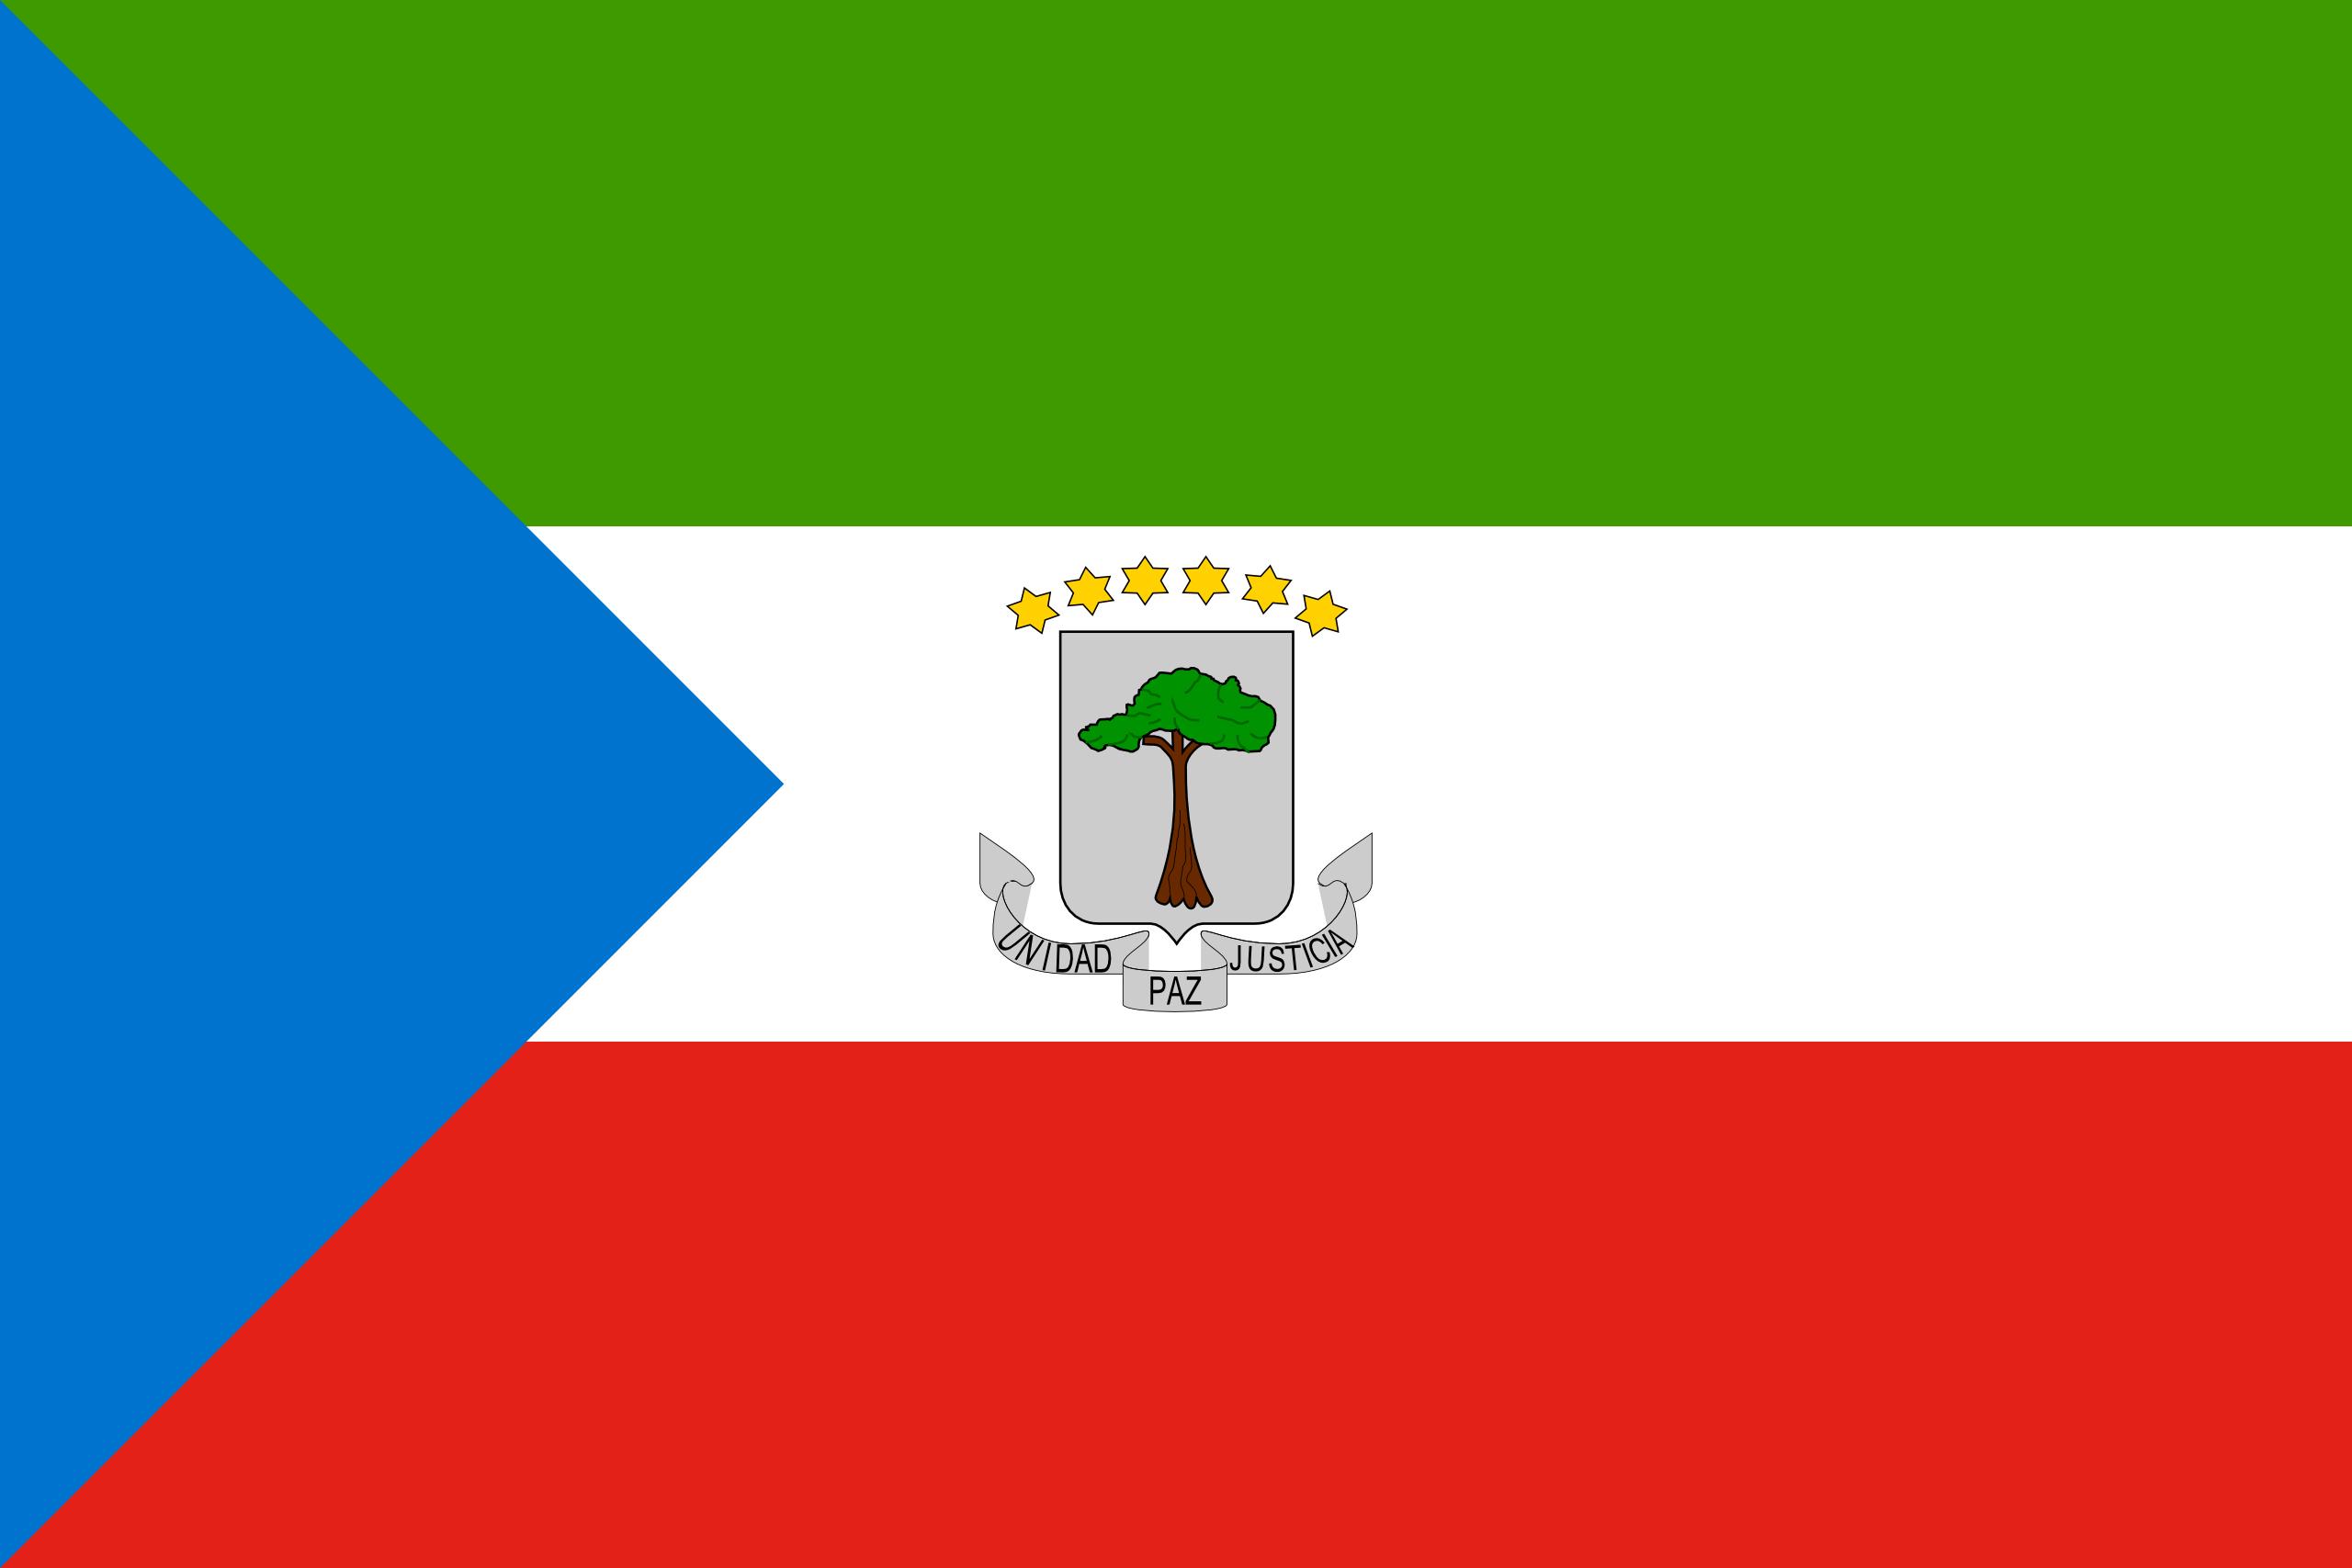 guinea ecuatorial, paese, emblema, logo, simbolo - Sfondi HD - Professor-falken.com